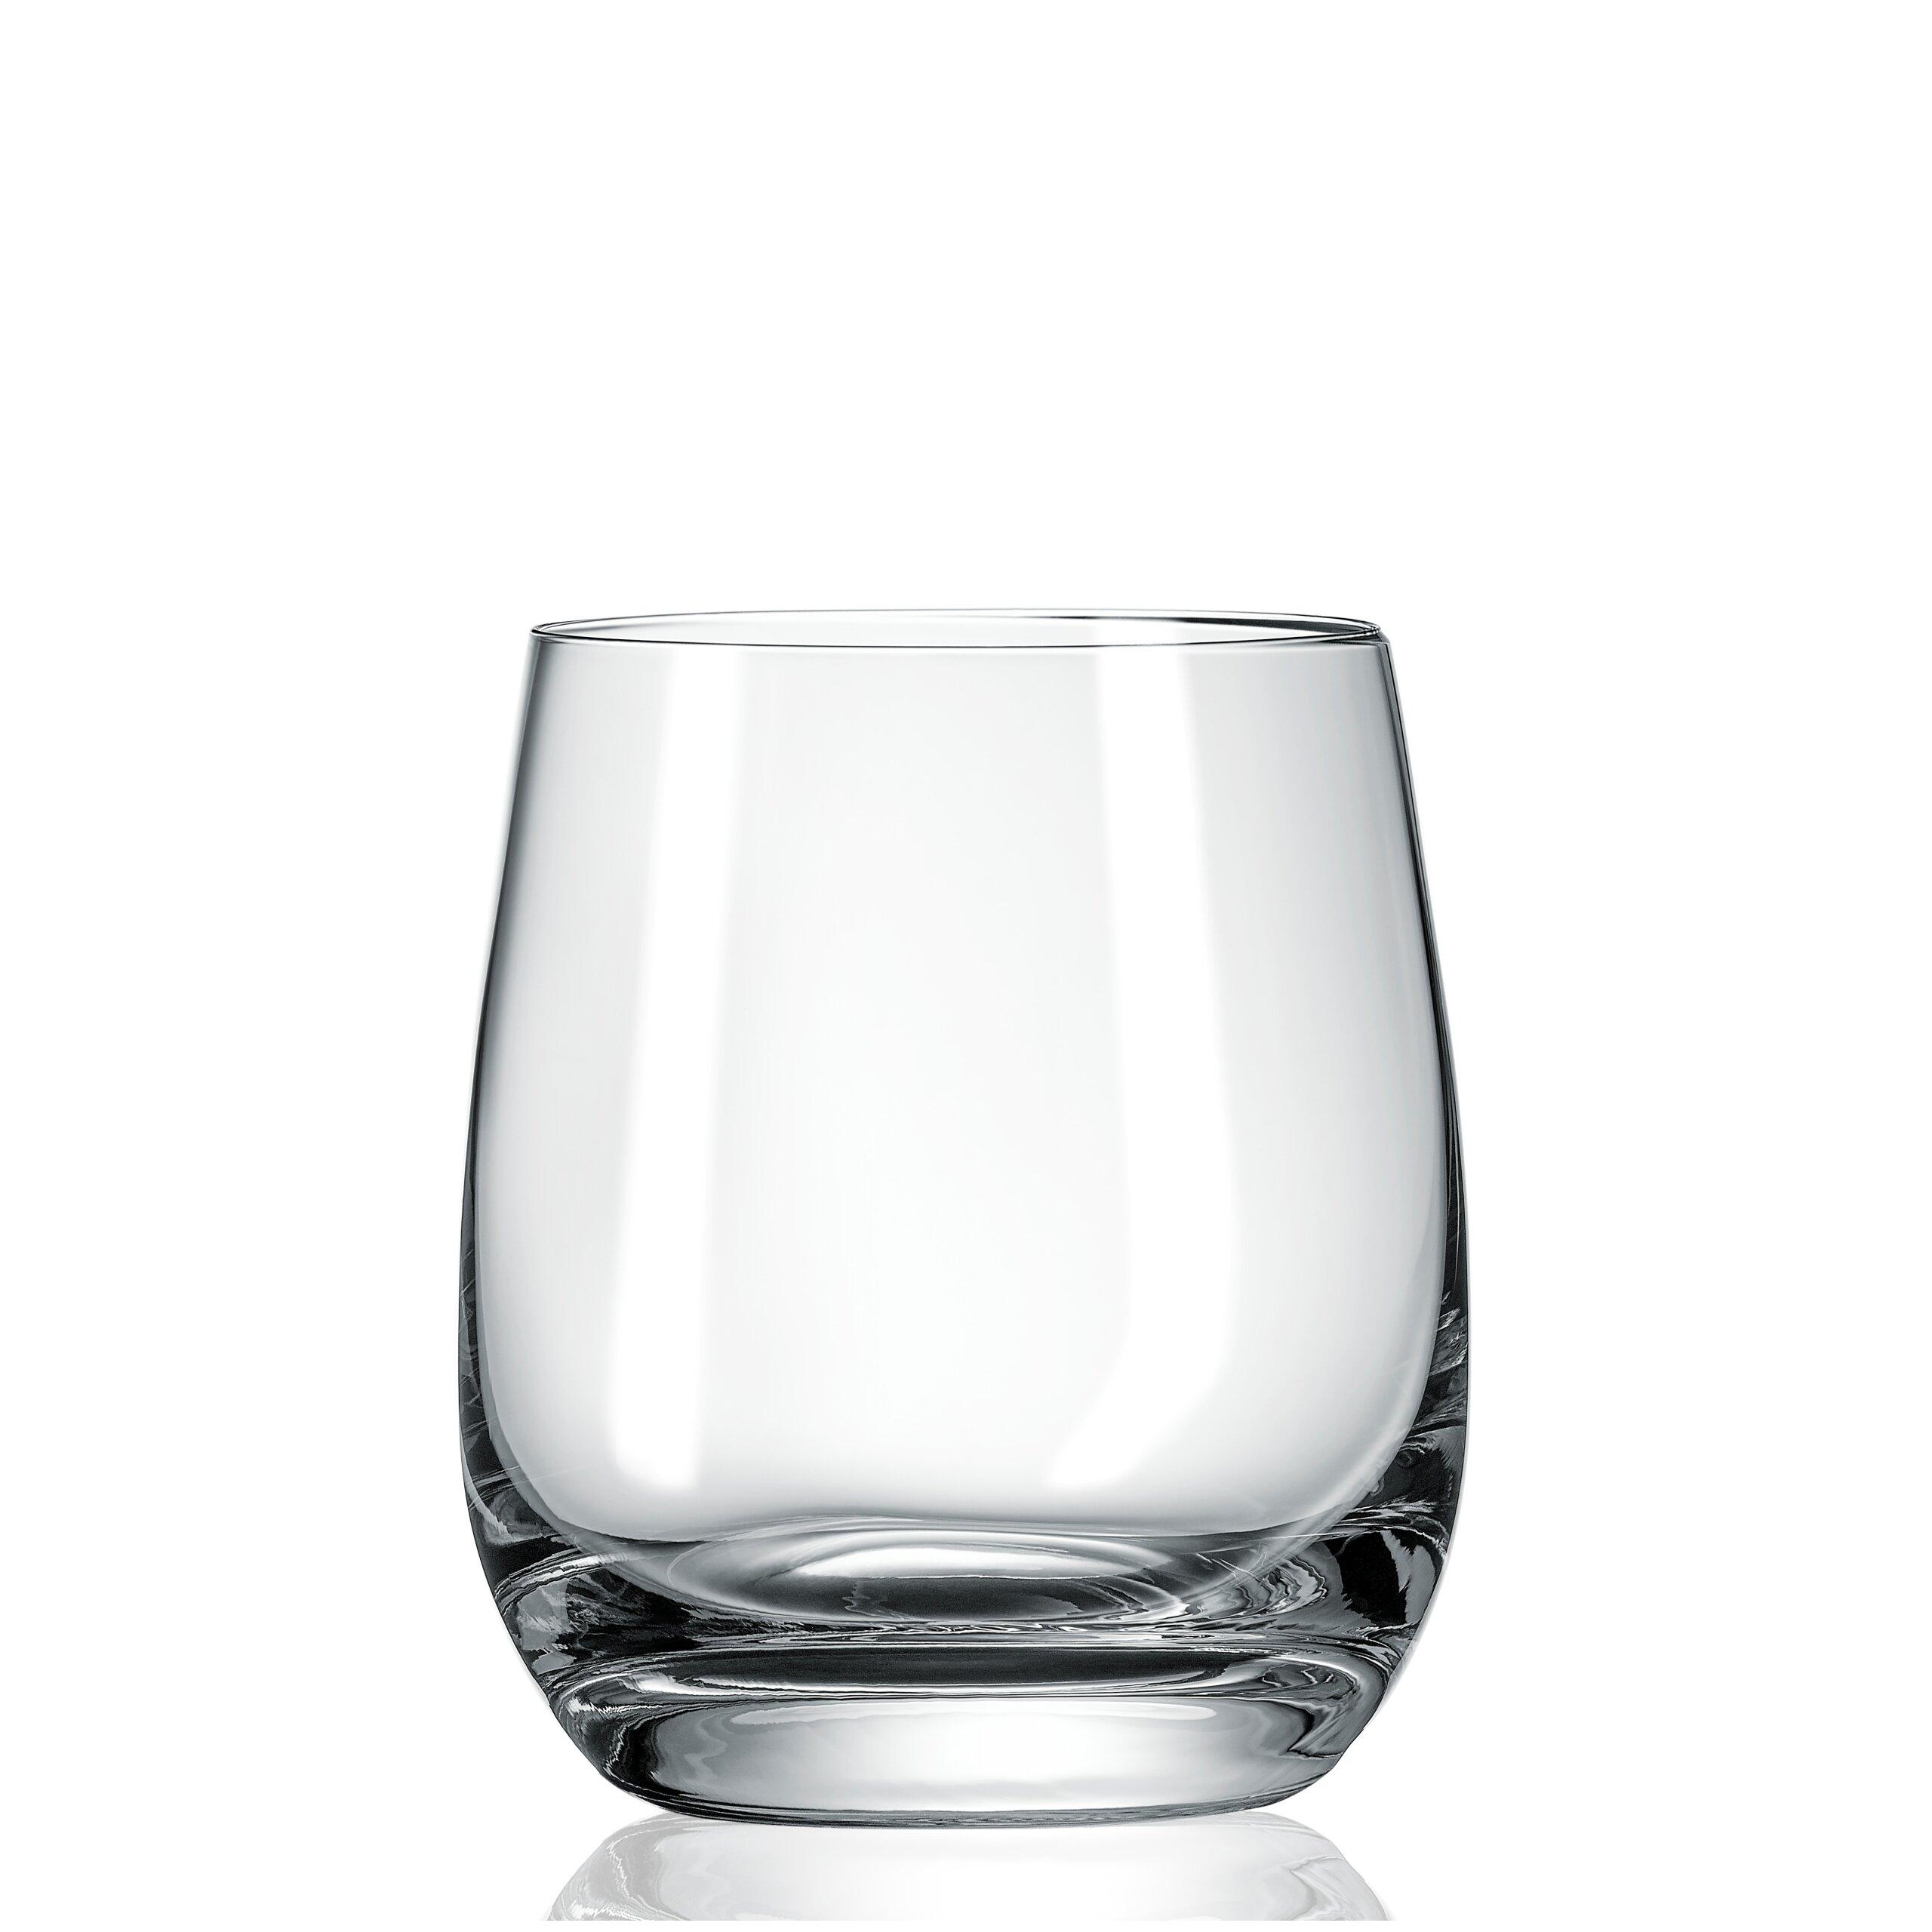 Whiskey Glasses Rona Drinkware You Ll Love In 2021 Wayfair